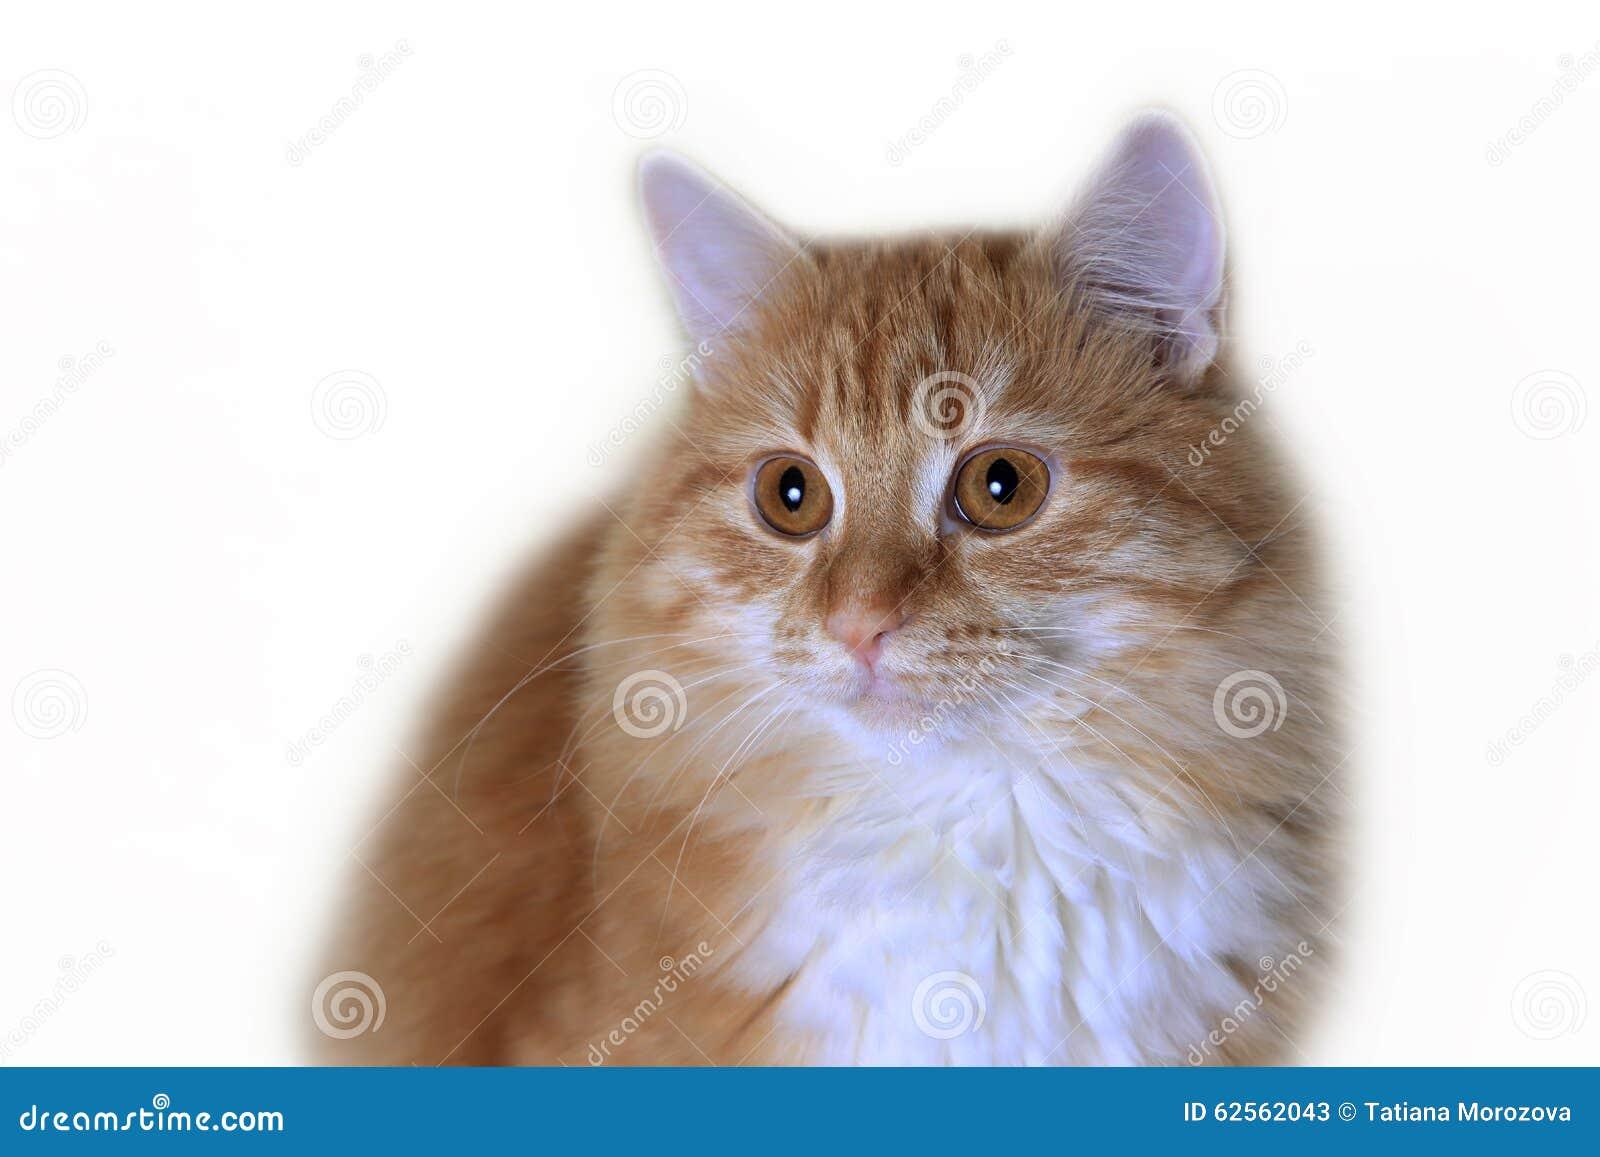 cat stomach problems symptoms